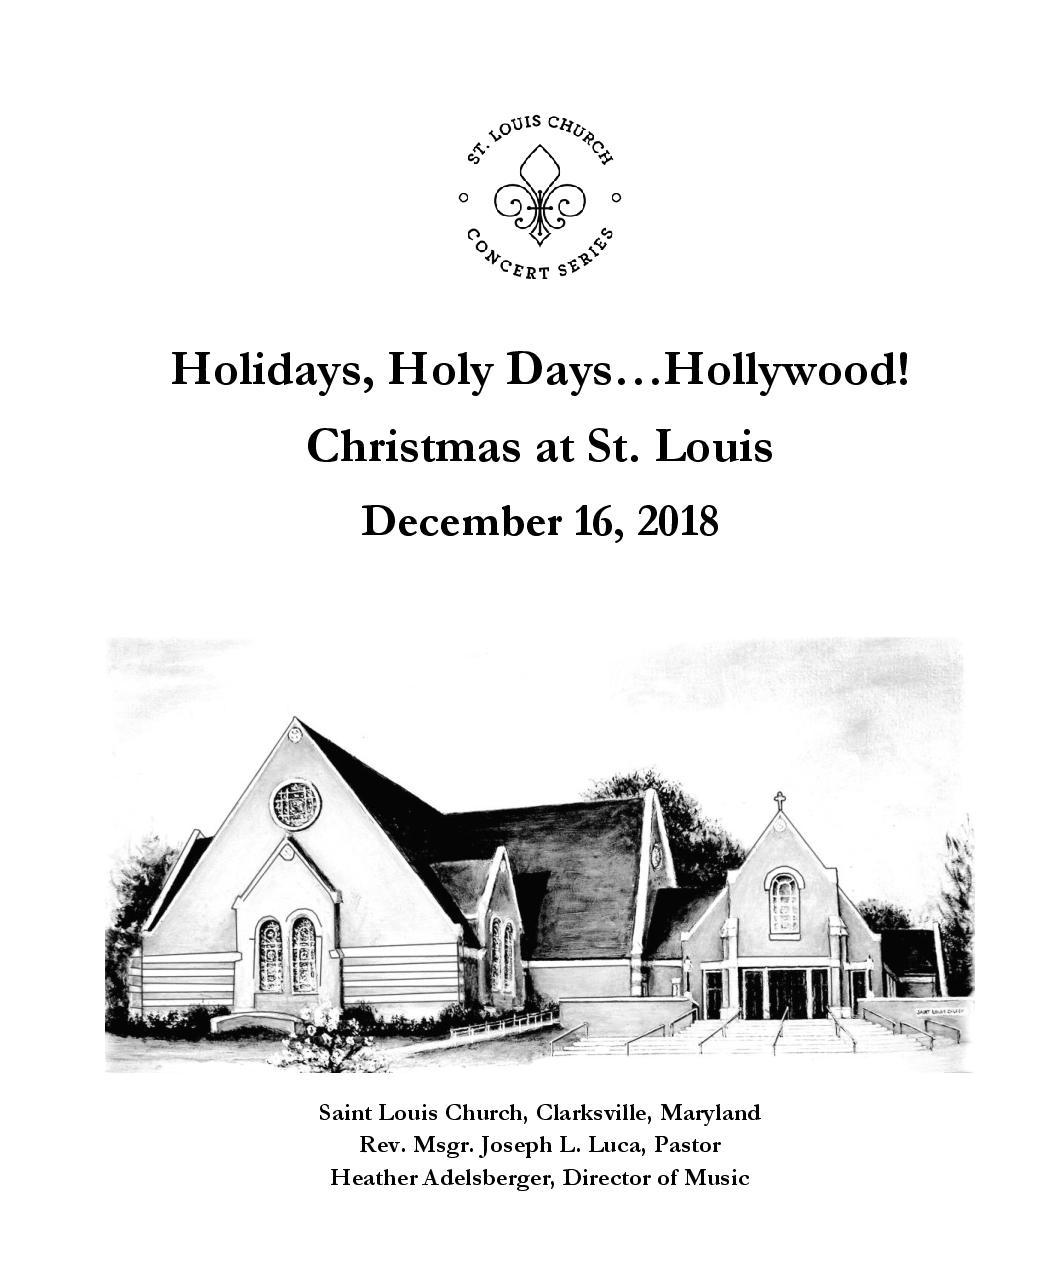 ChristmasProgram_14DEC18-FINAL-REV3-page-001.jpg